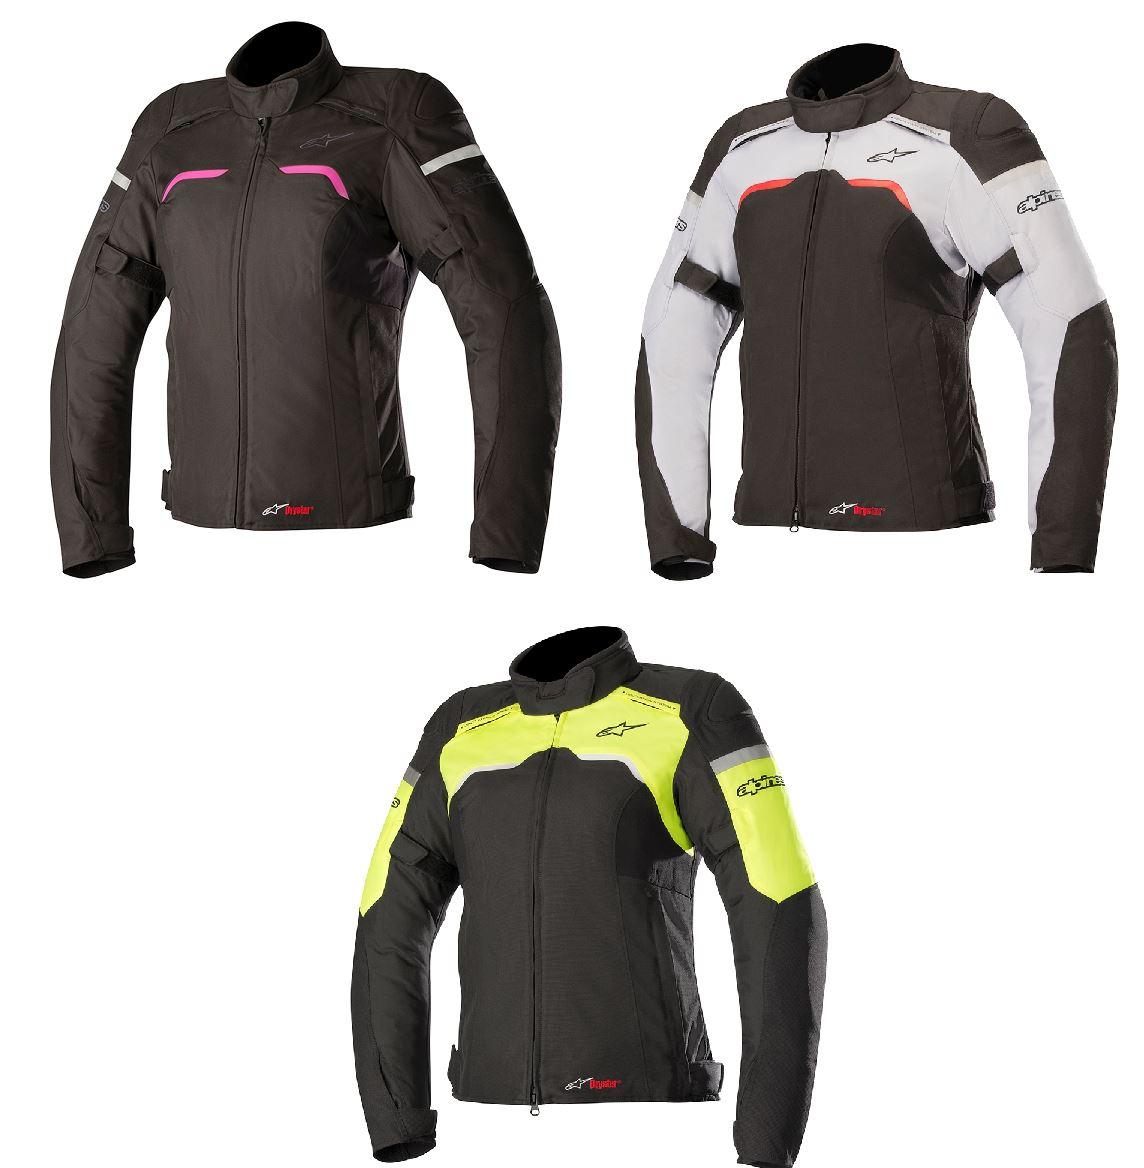 b5475080a63 Alpinestars Stella Drystar hiper textil chaqueta forro térmico desmontable  del montar a caballo